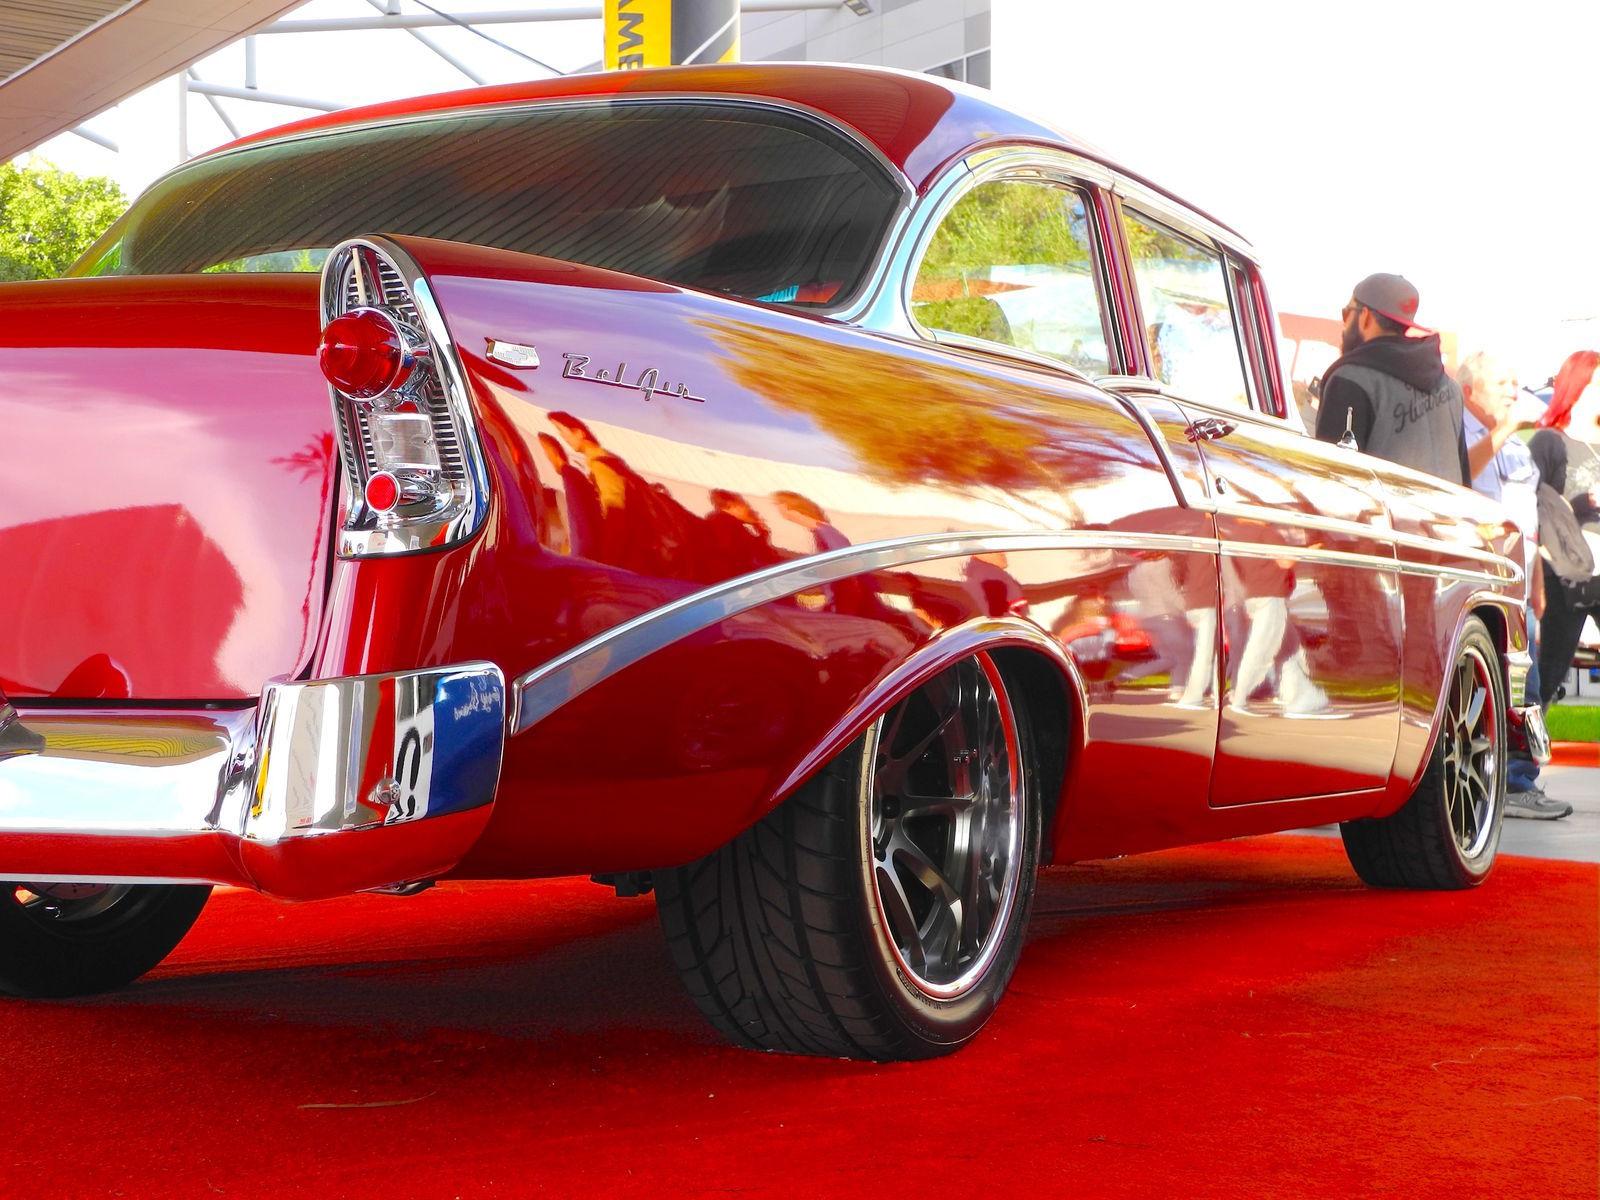 1956 Chevrolet Bel Air | Flat 12 Gallery's